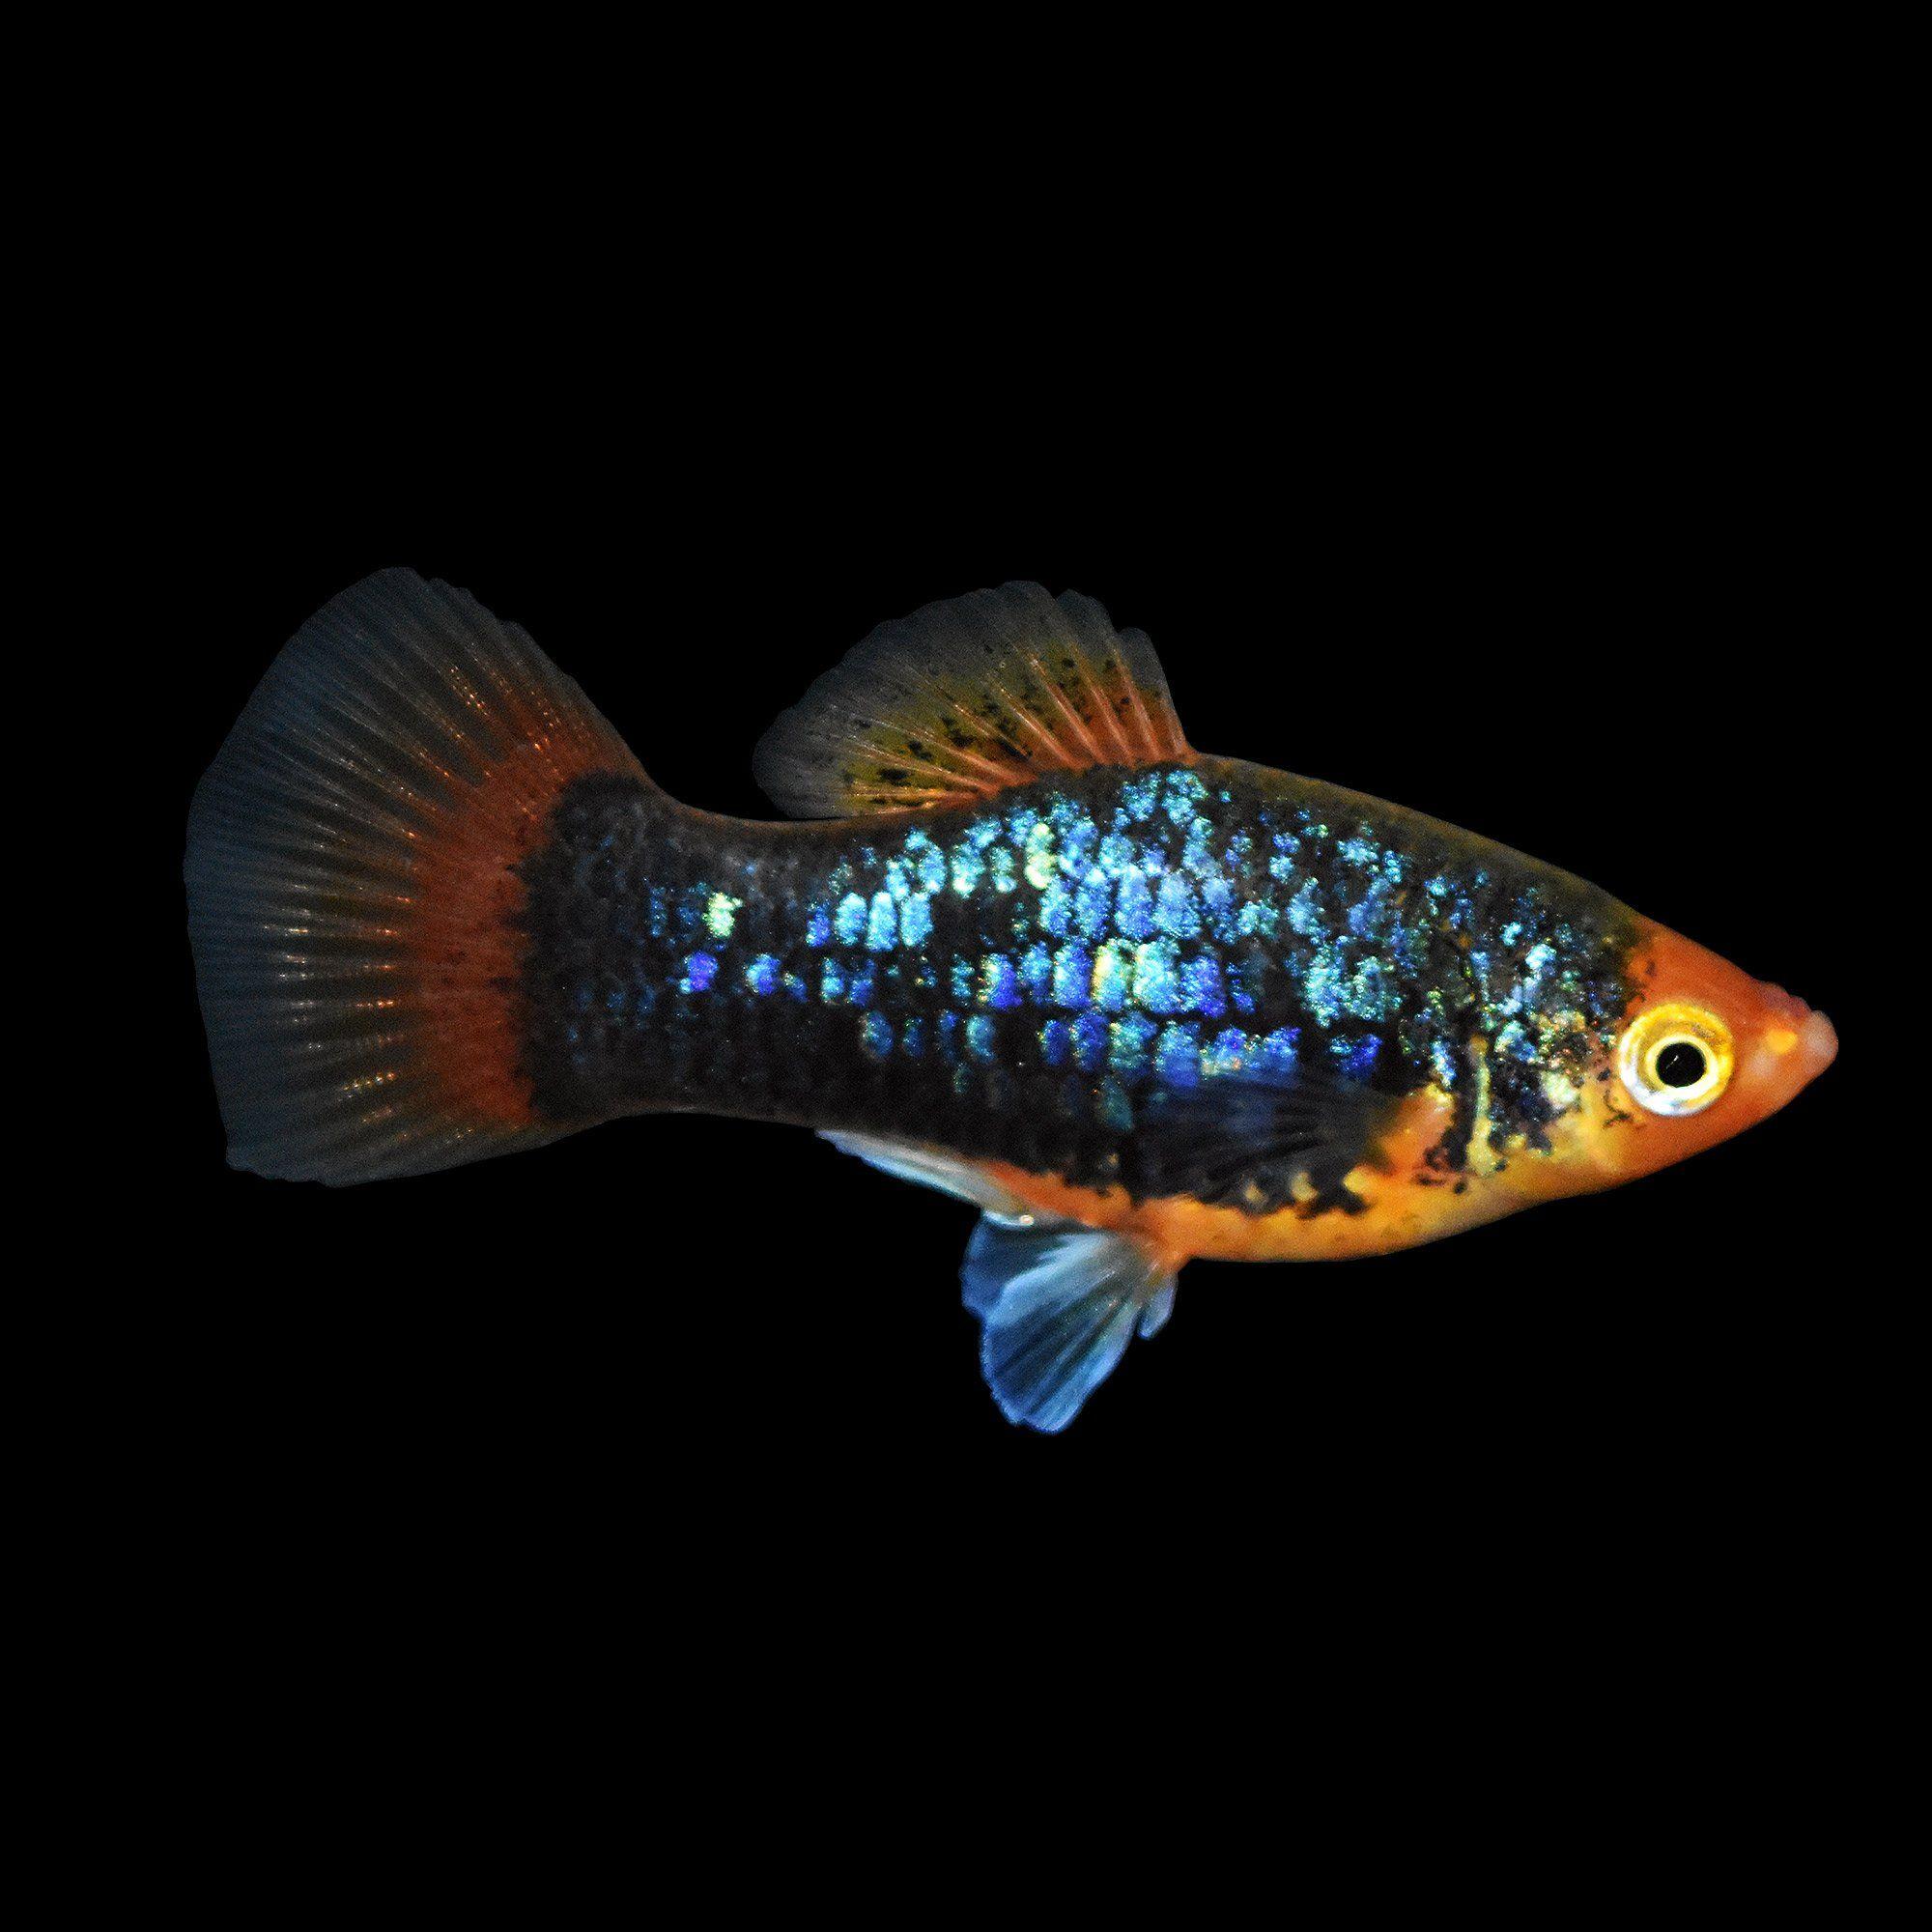 Tall And Beautiful Just For Your Home Aqueon 15 Gallon Column Deluxe Aquarium Kit Petsmart 79 99 Aquarium Fish Tank Cool Fish Tanks Fish Tank